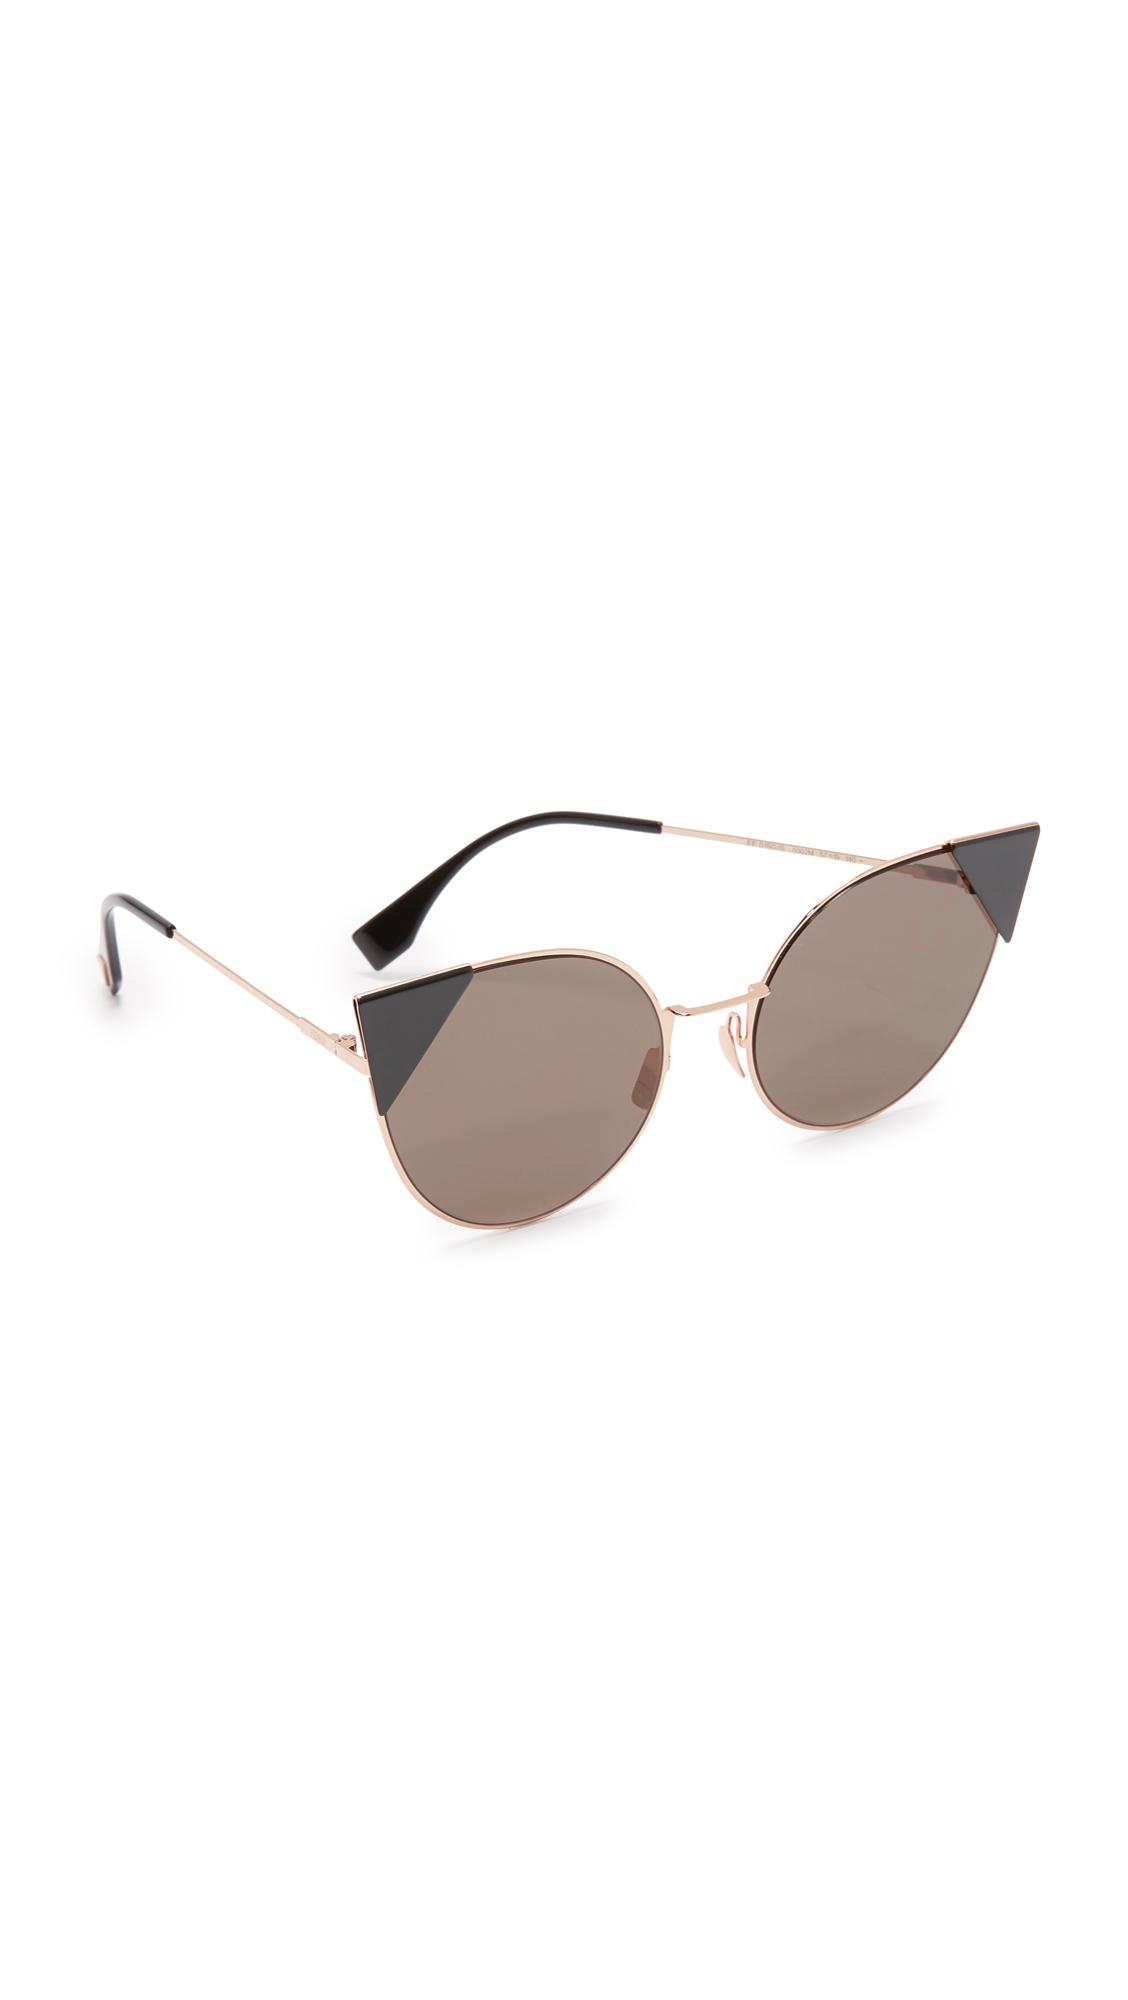 Fendi Arrow Accent Sunglasses - Rose Gold Black/Black at Shopbop